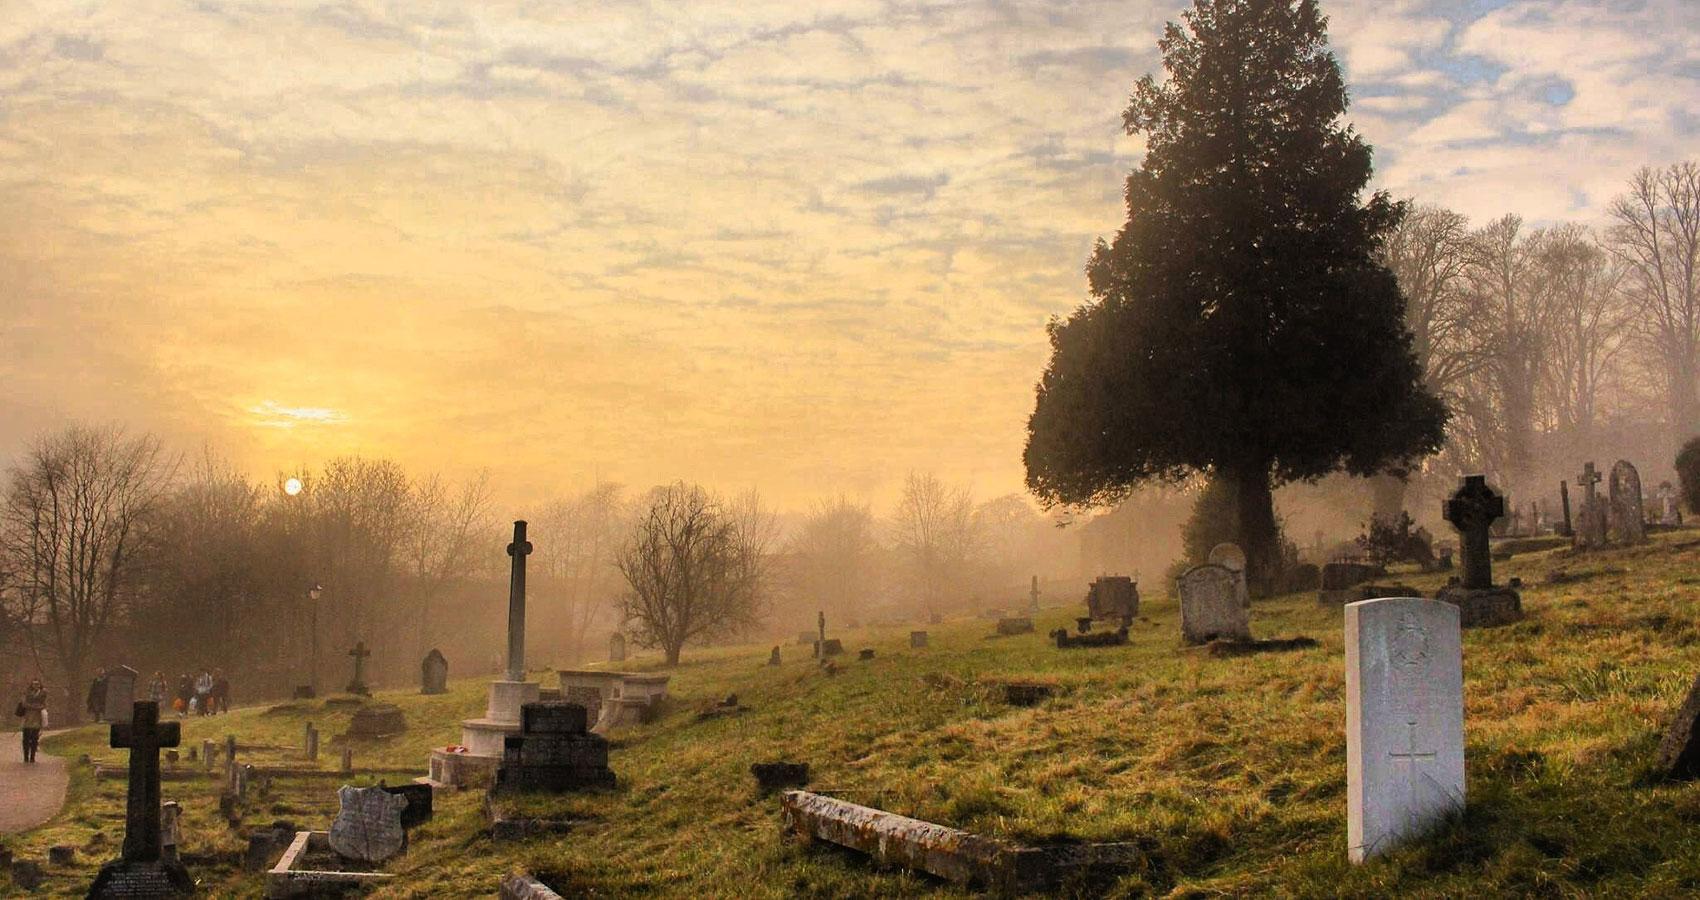 The Graveyard, a poem written by Julian Lee at Spillwords.com